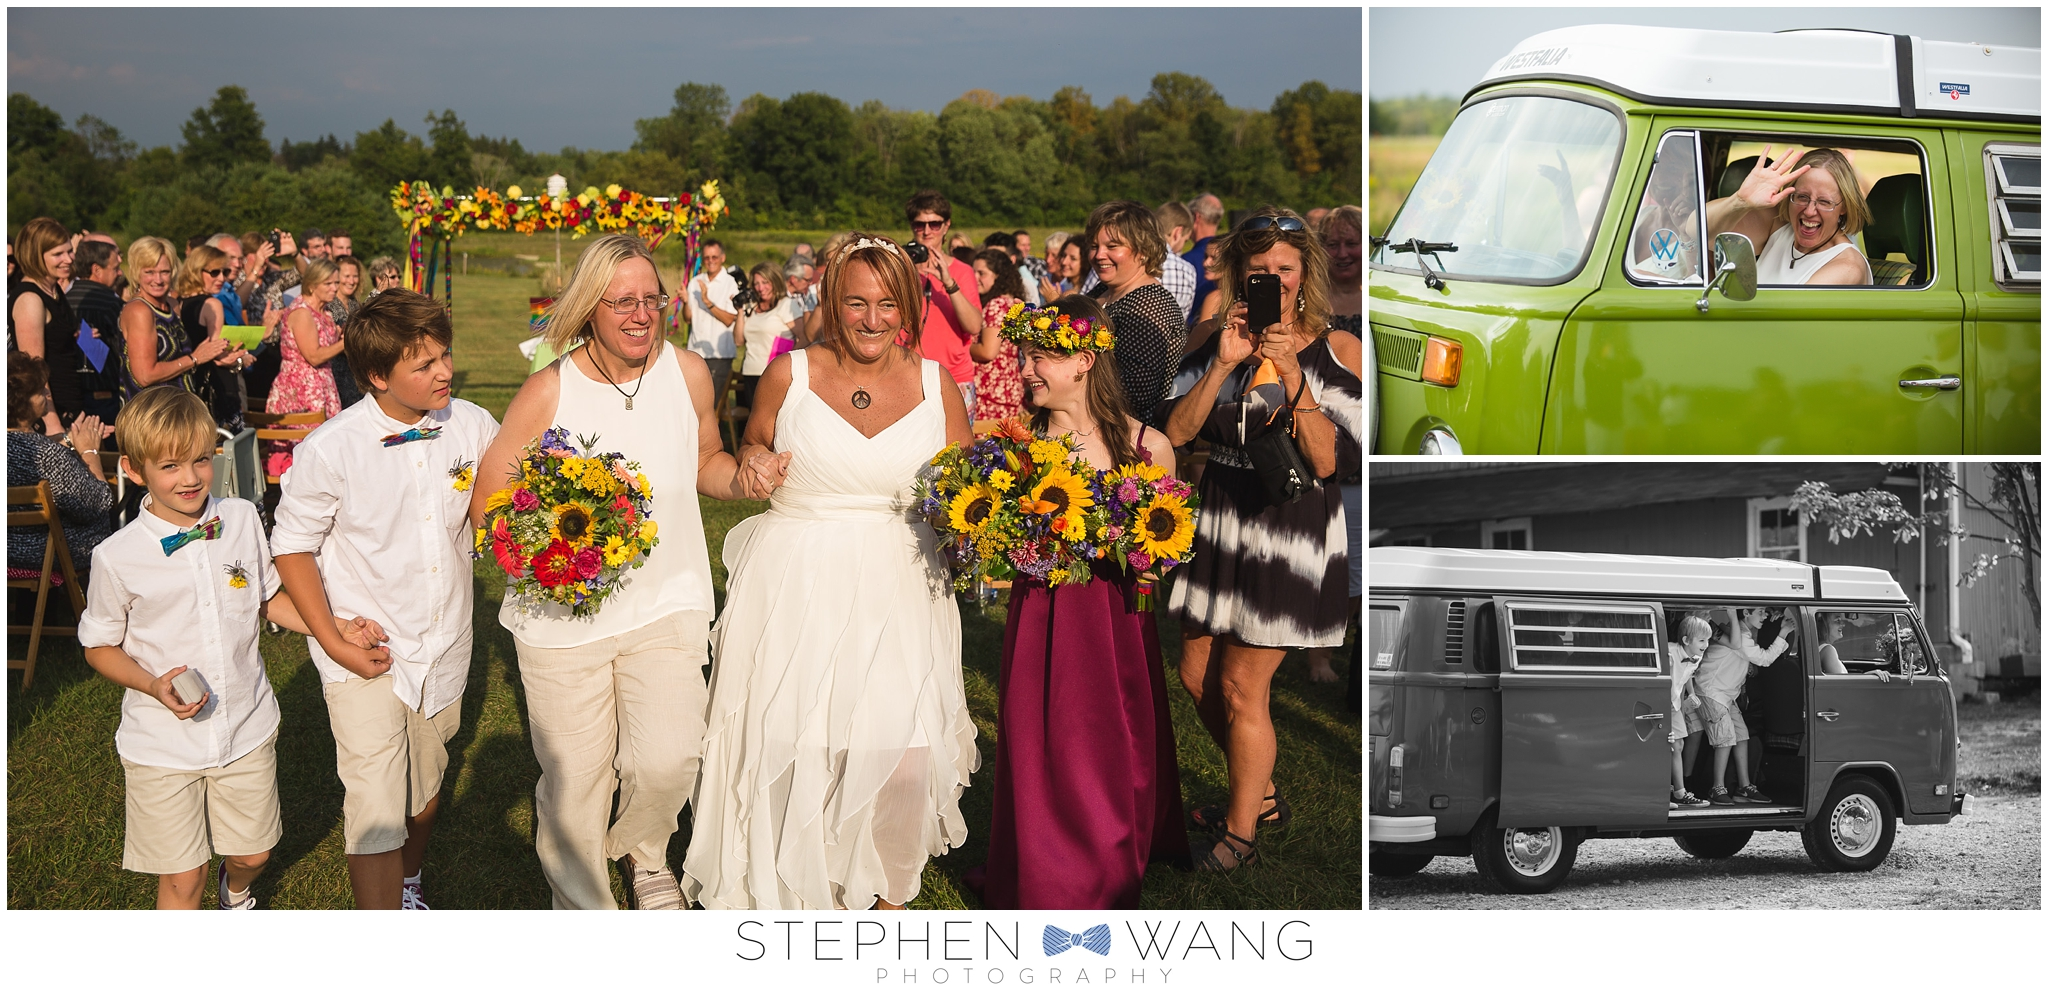 ct wedding photographer stephen wang photography crown point ecology center same sex wedding akron ohio hippie wedding tie die volkwagen bus vw peace connecticut wedding photographer-09-24_0017.jpg